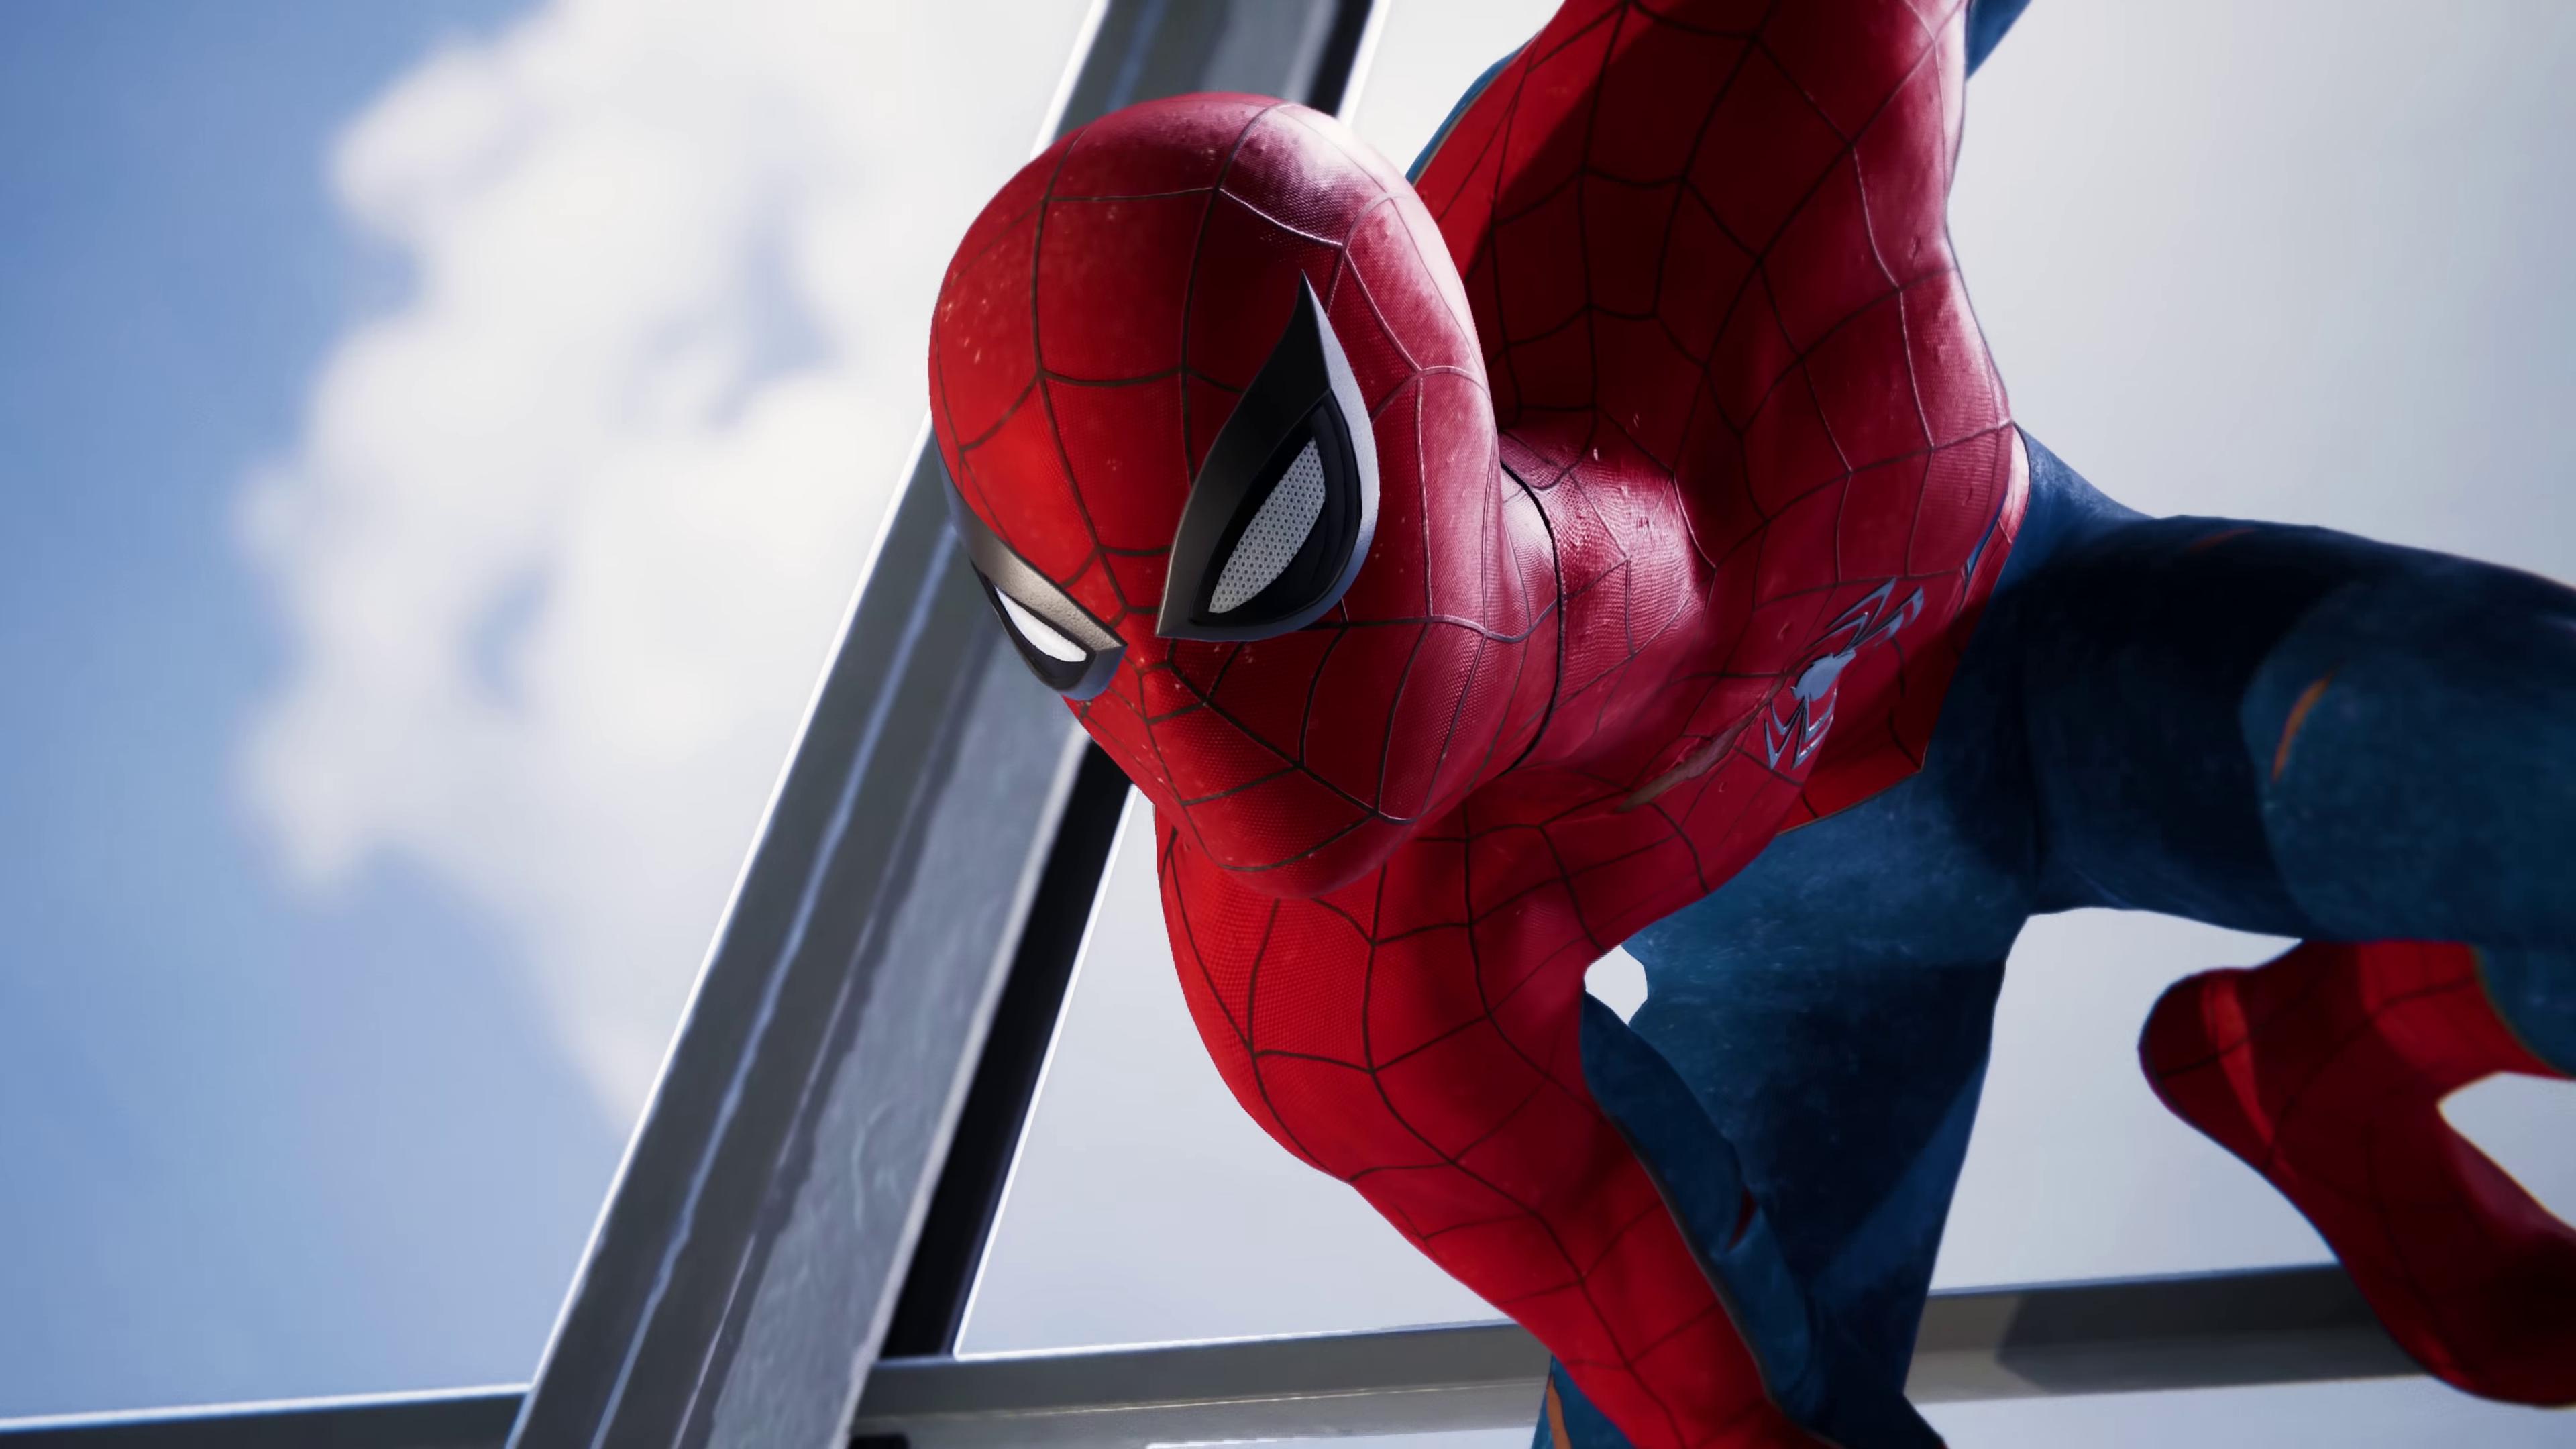 Spider Man Ps4 Classic Suit Wallpaper 4k Ultra Hd Wallpaper